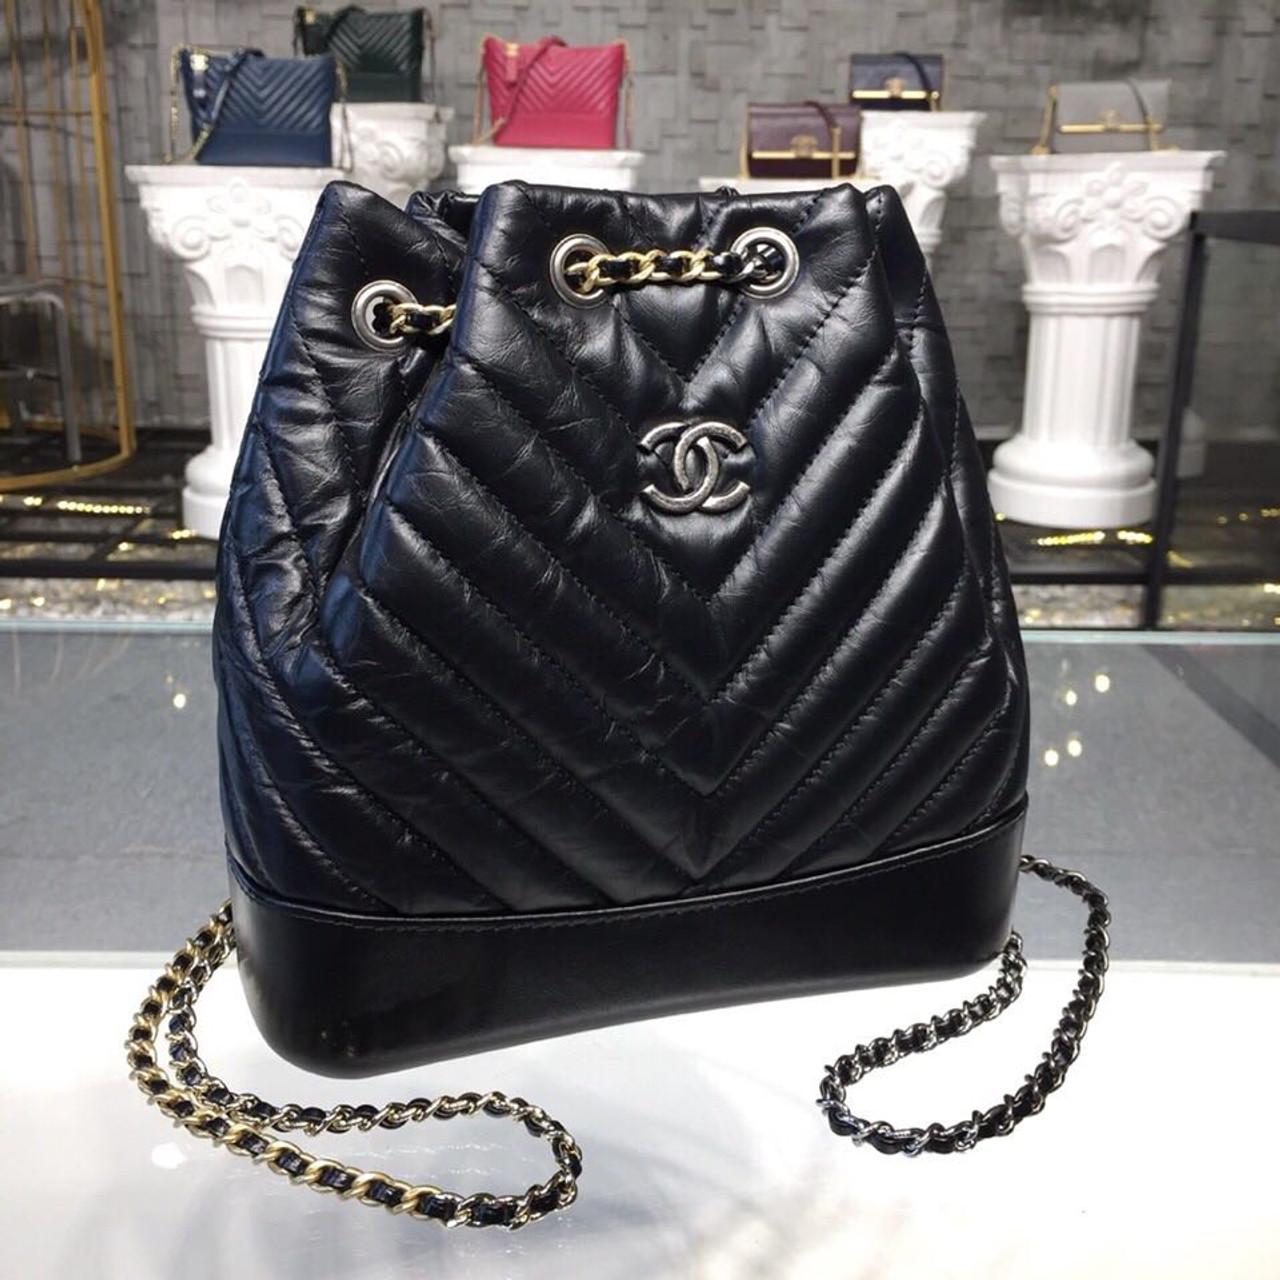 4d02a6106e4fa1 Chanel Gabrielle Chevron Backpack Bag Small 20cm Aged Calfskin Leather  Fall/Winter Act 1 2018